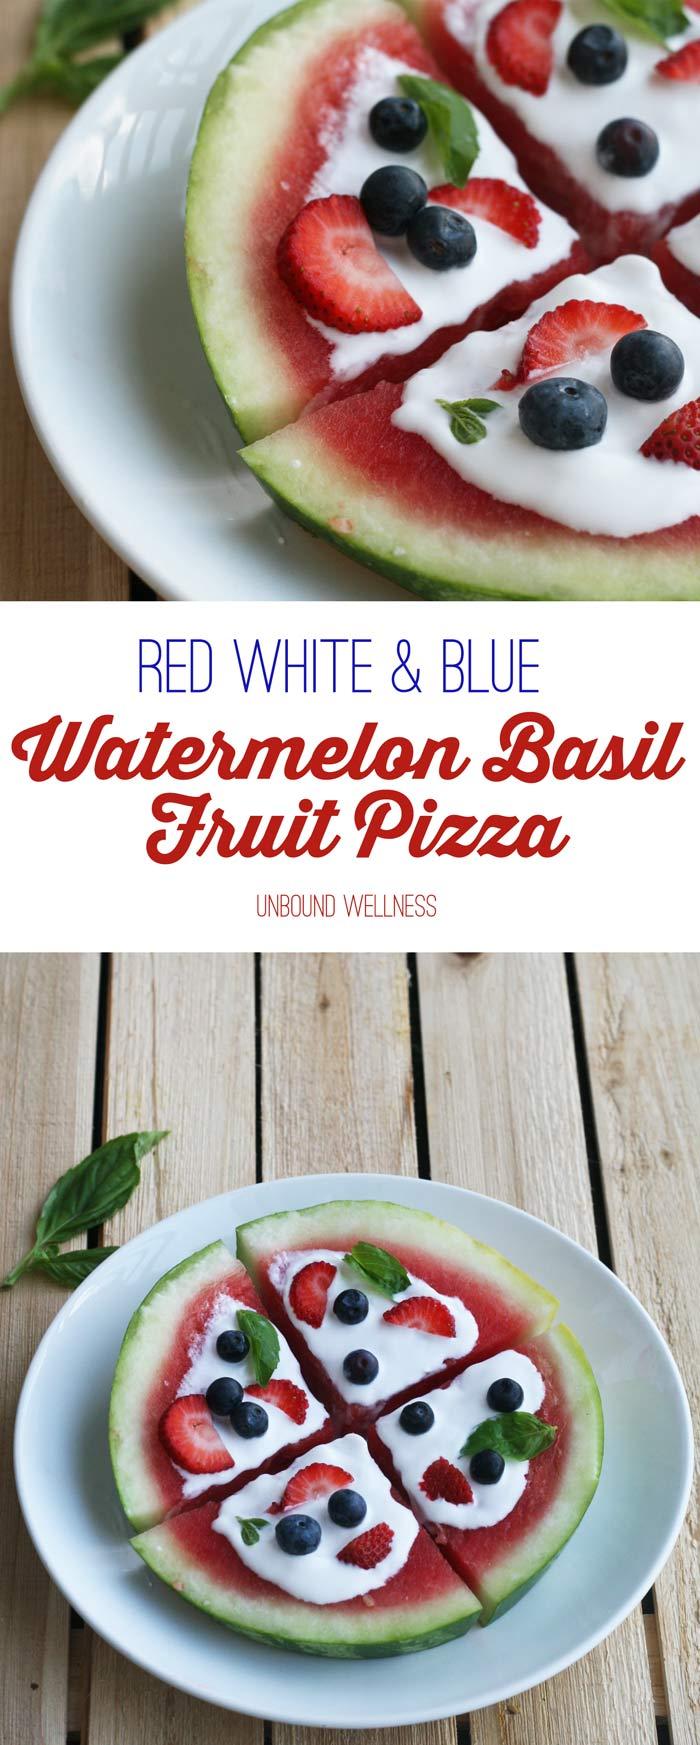 Red White & Blue Watermelon Basil Fruit Pizza (AIP & Vegan)